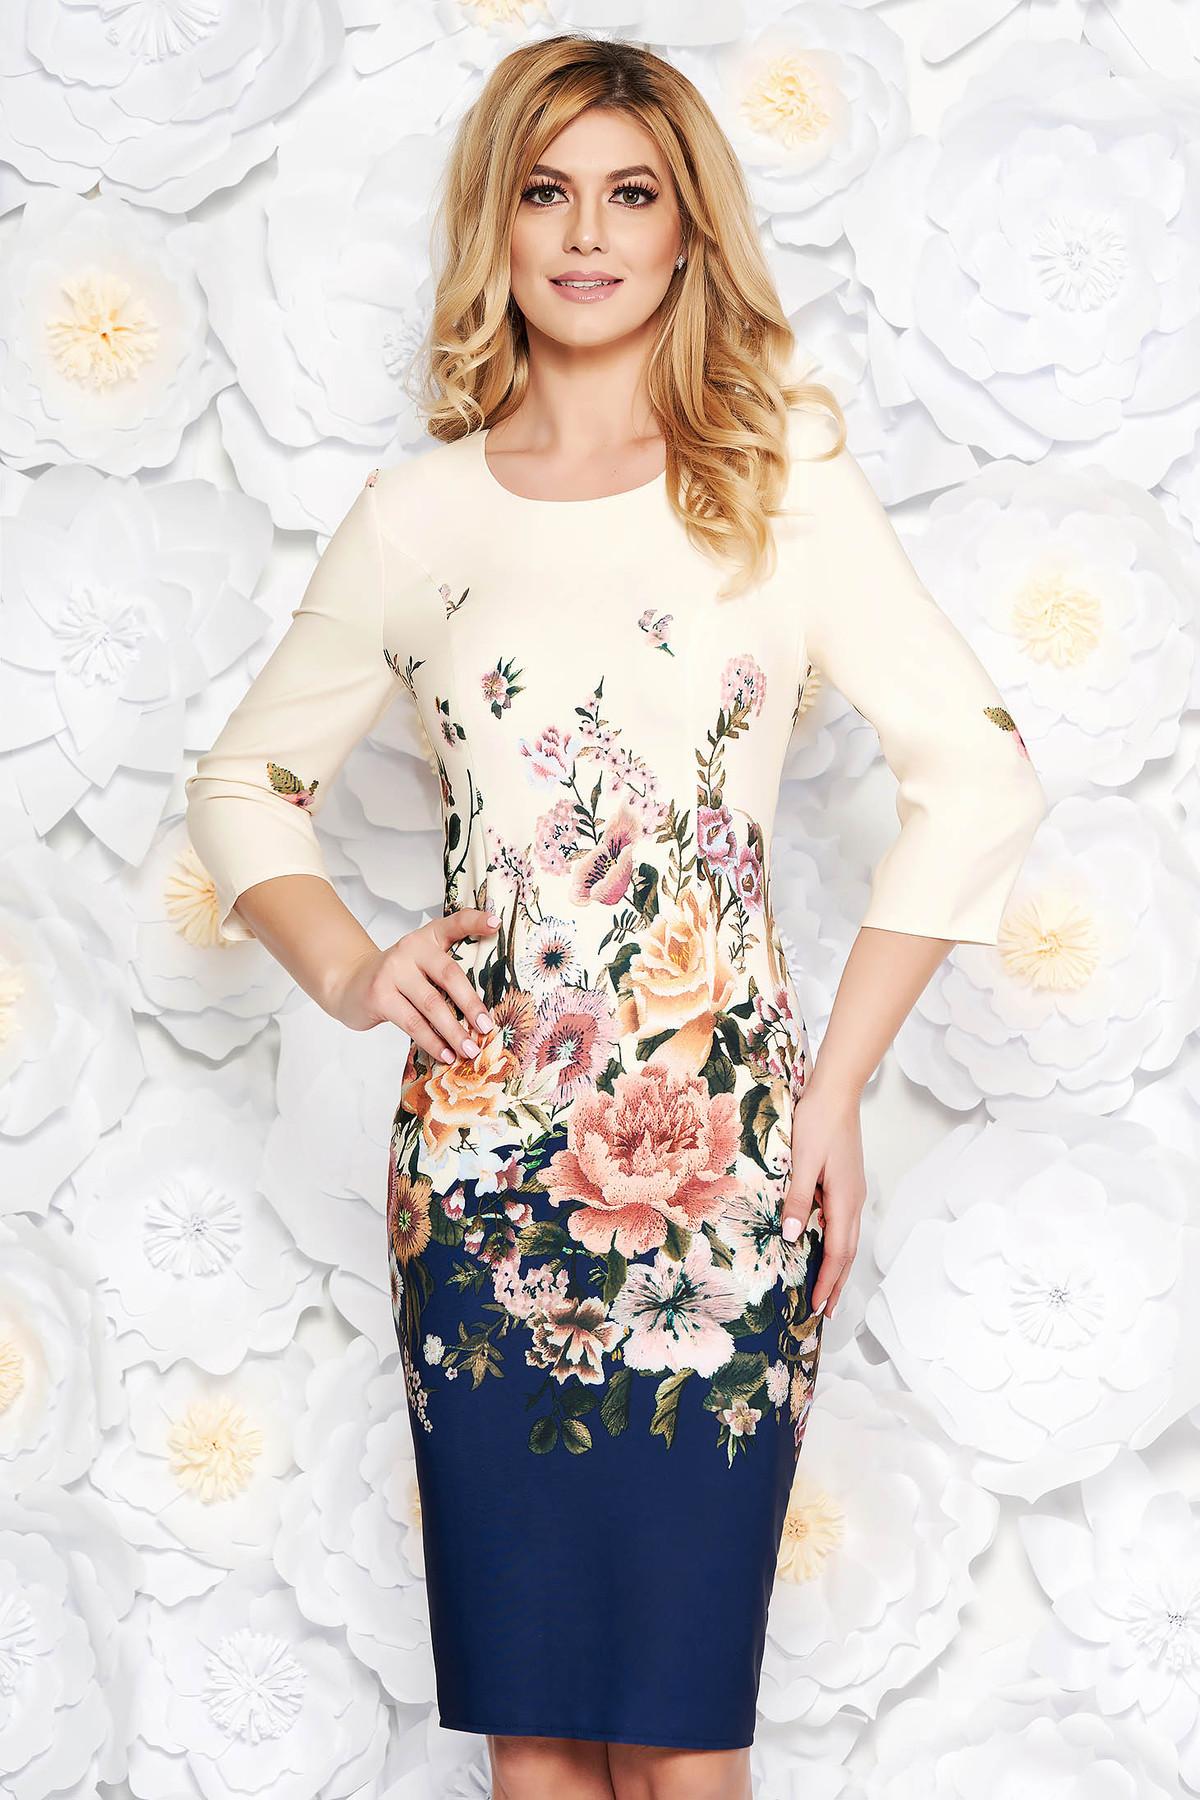 Rochie albastra-inchis de zi tip creion din stofa subtire usor elastica cu imprimeuri florale